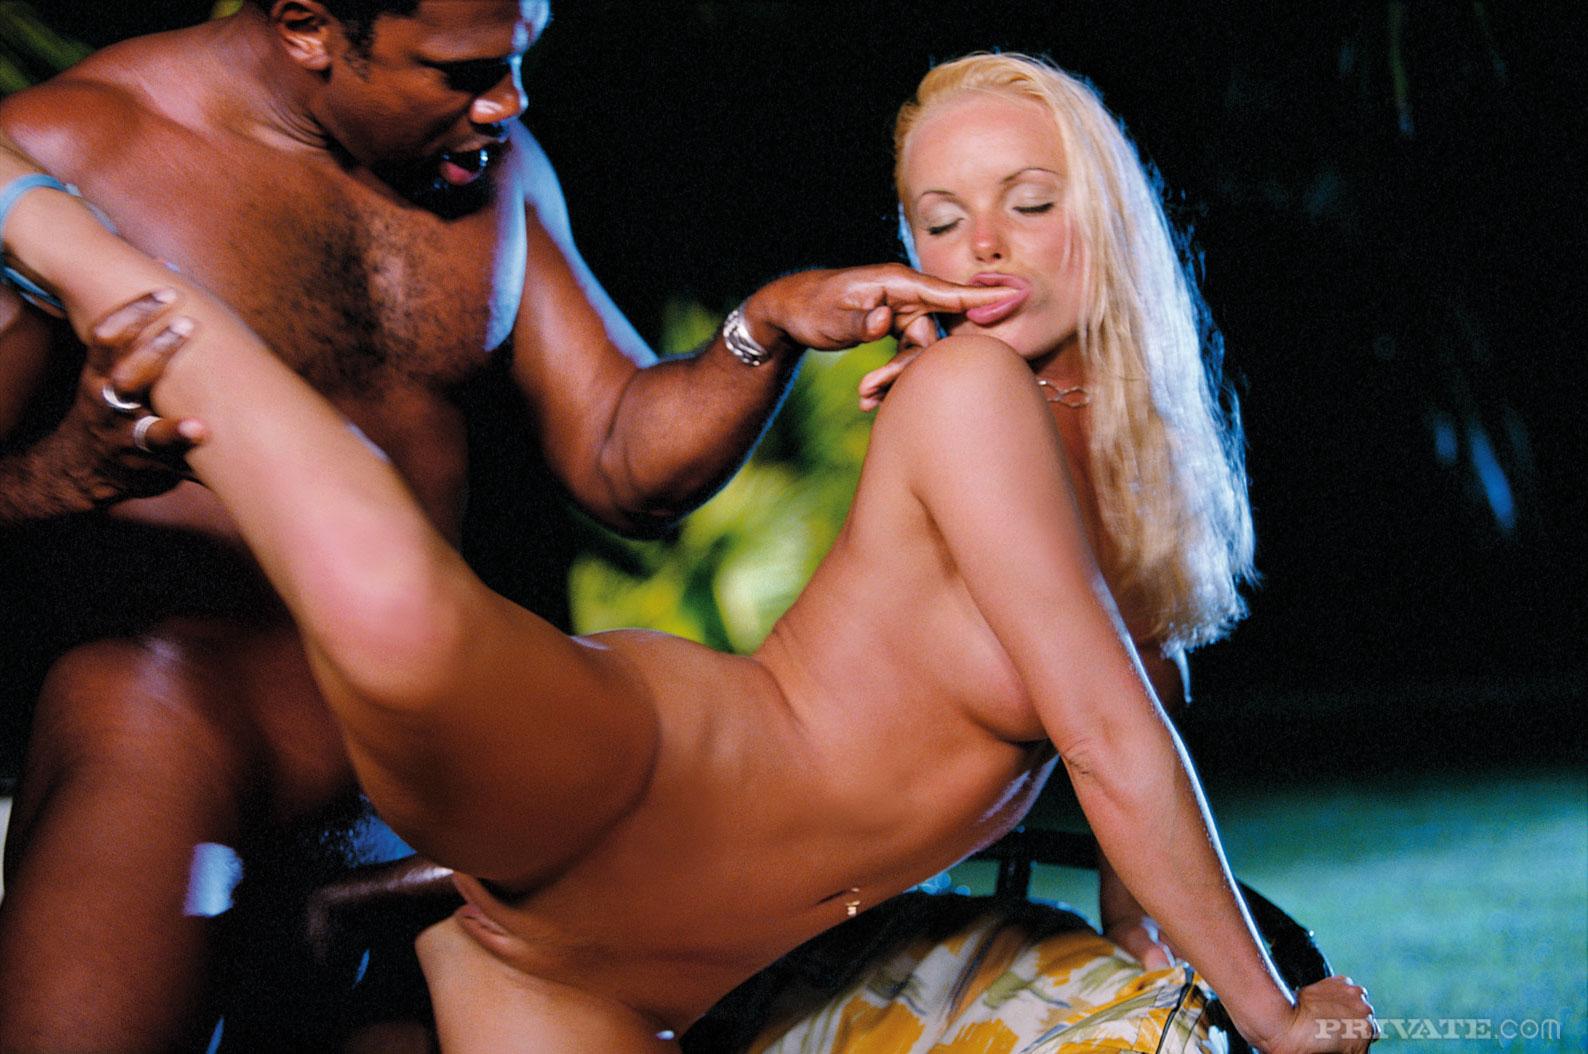 Hot latin pussy videos